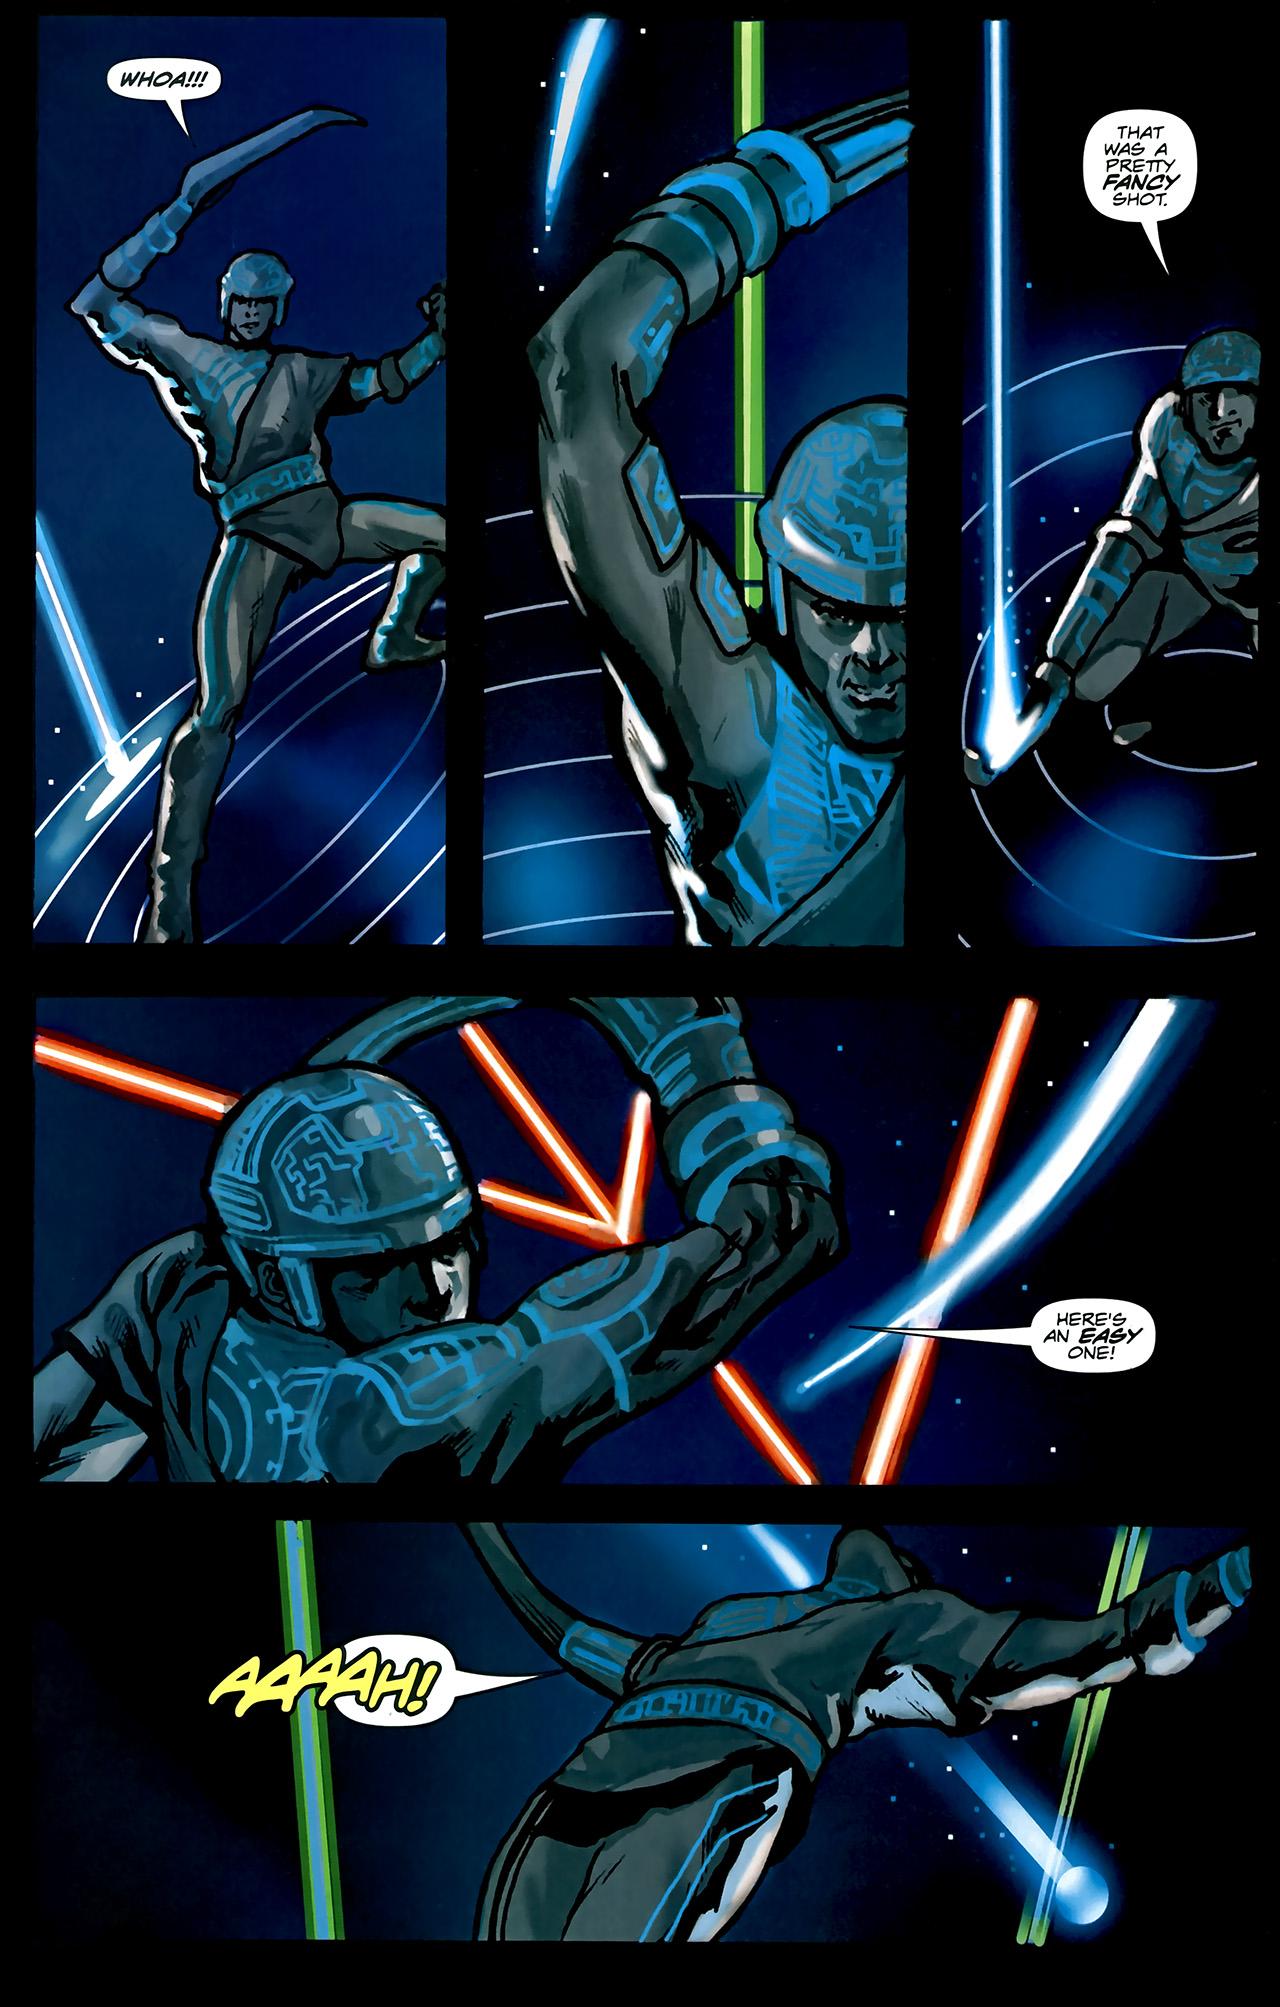 Read online TRON: Original Movie Adaptation comic -  Issue #2 - 5